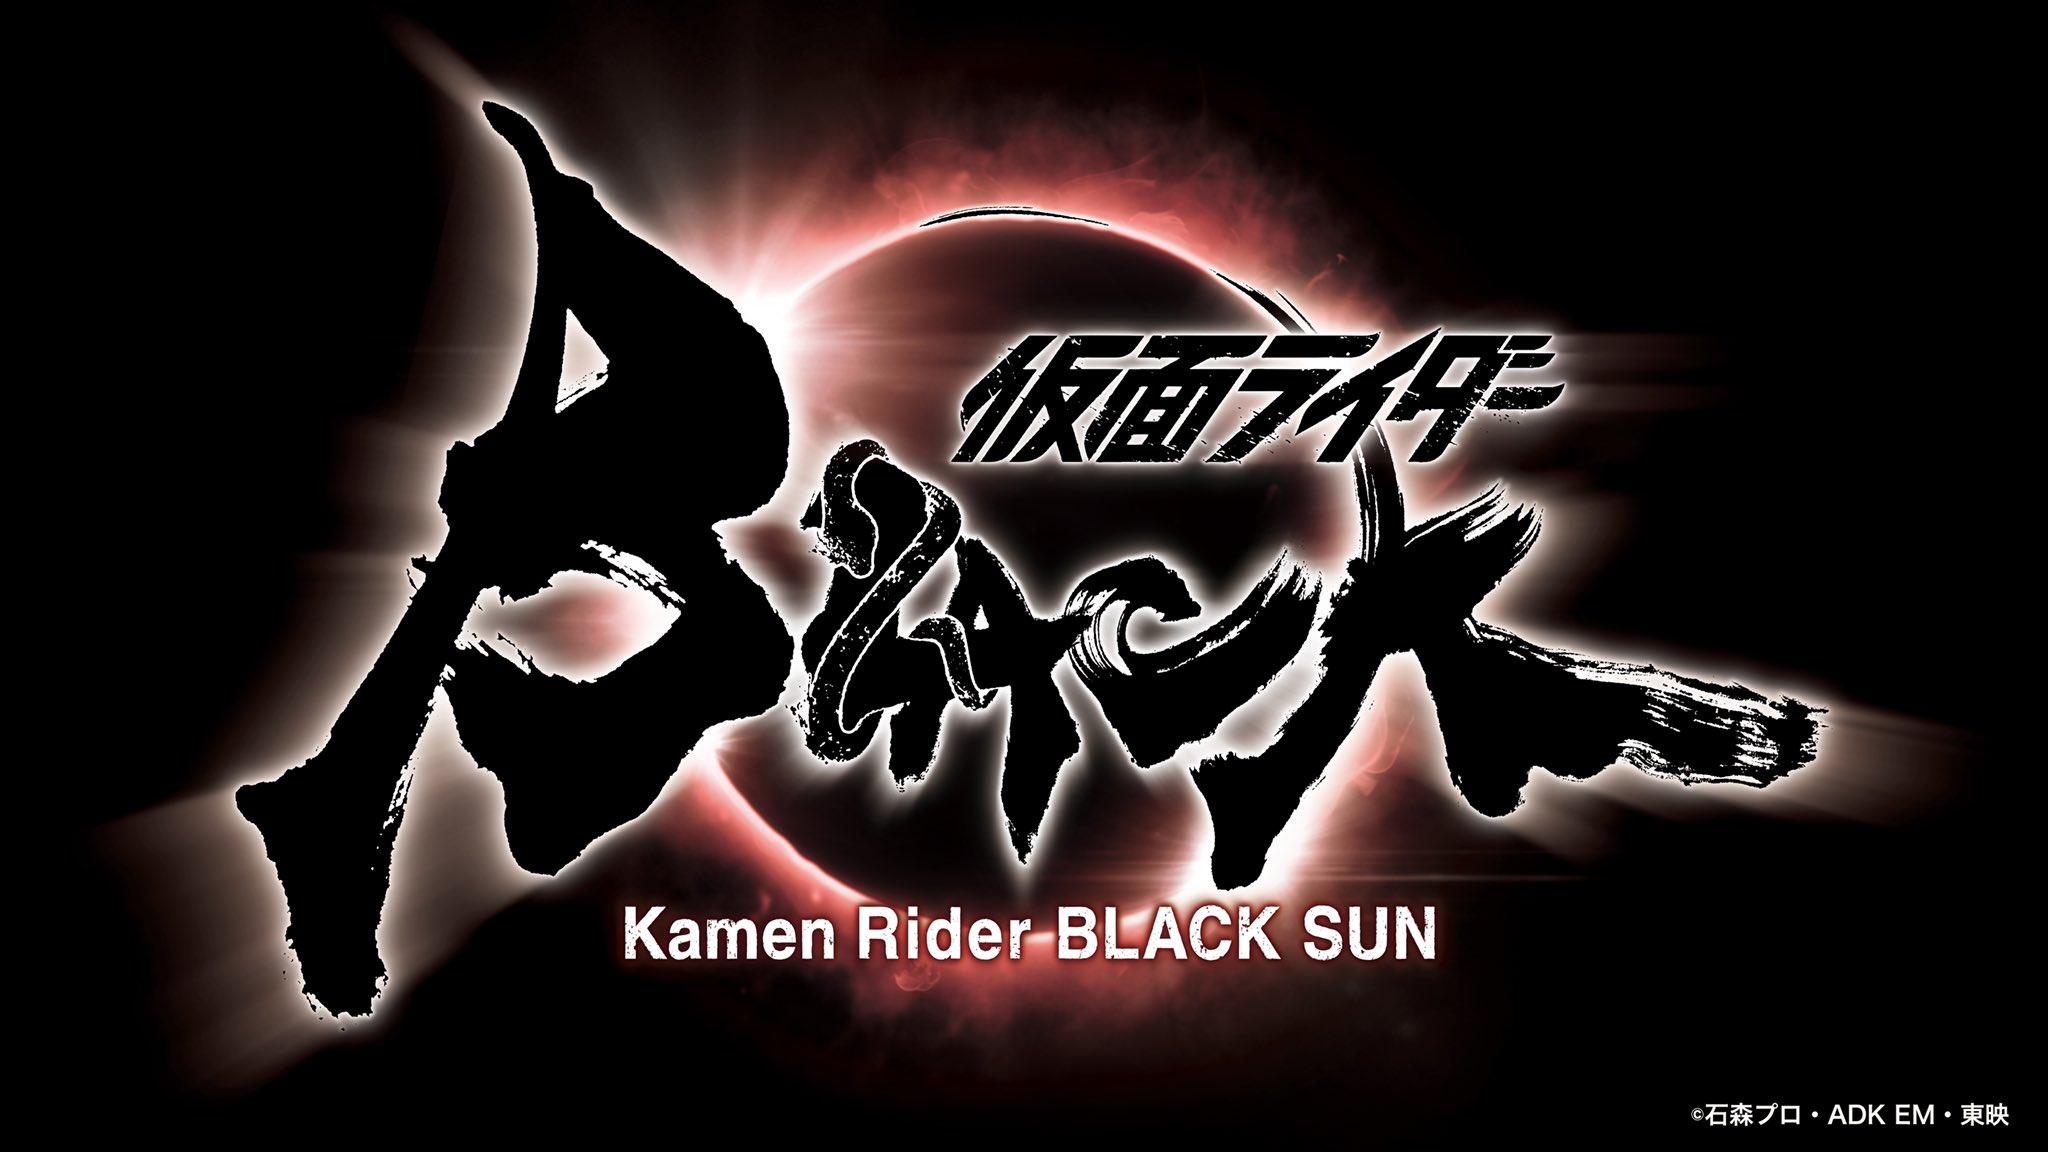 Kamen Rider BLACK SUN Logo